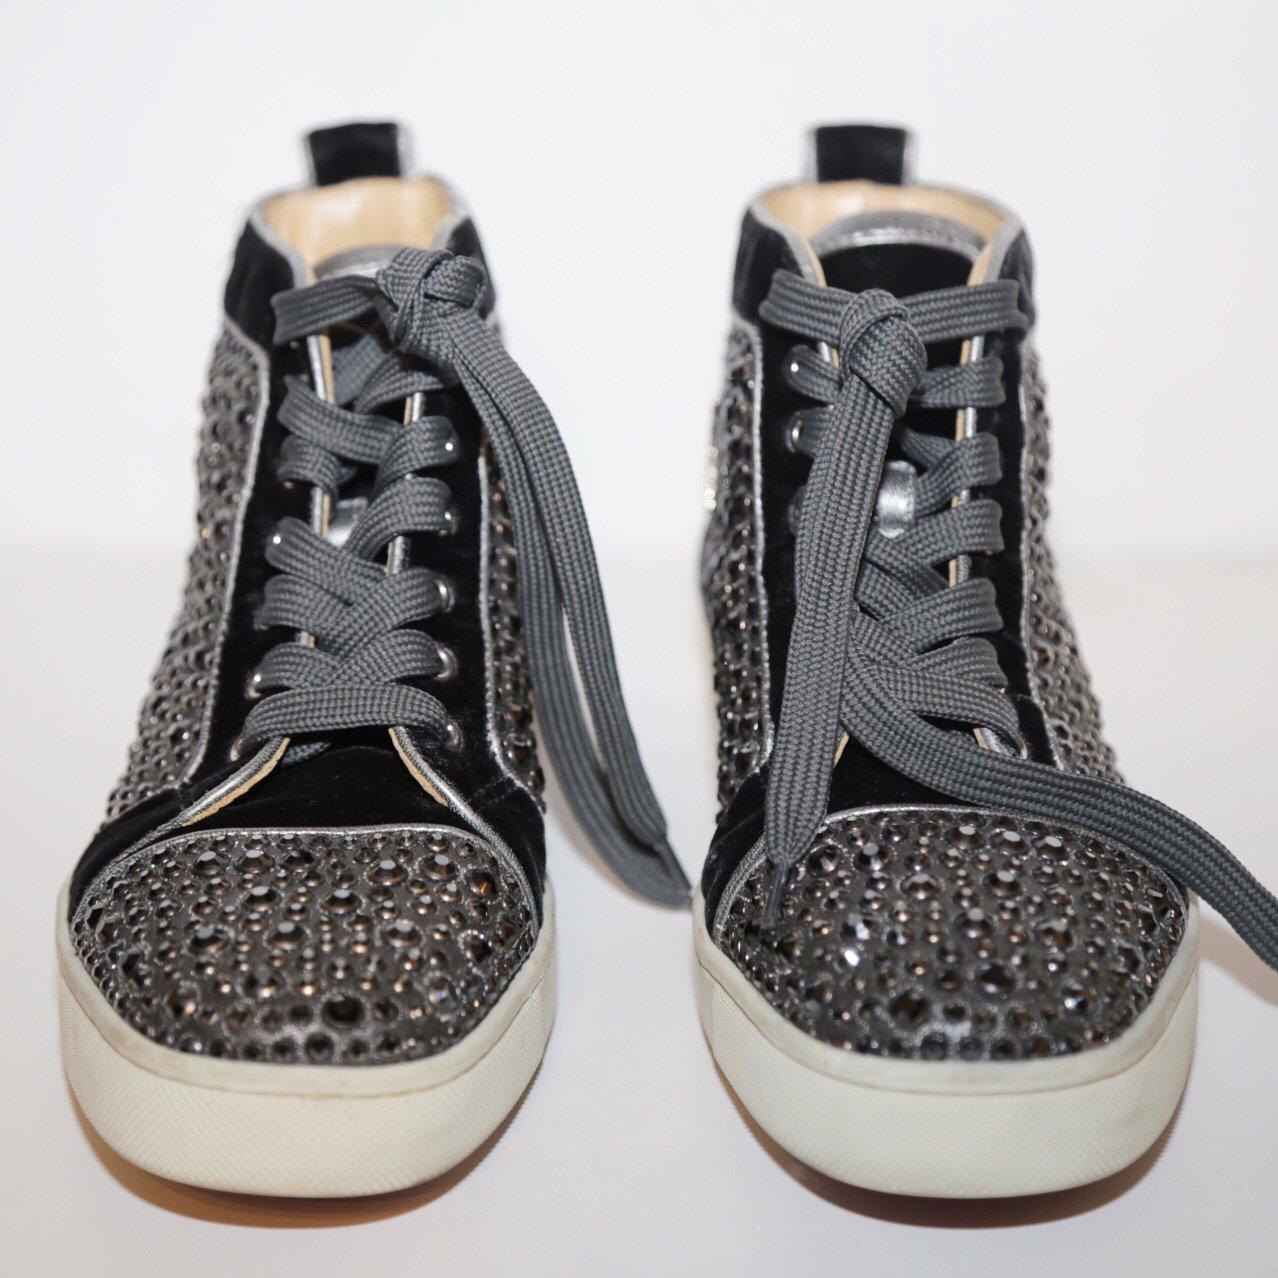 christian louboutin sneakers trunk show designer consignment rh trunkshowconsignment com